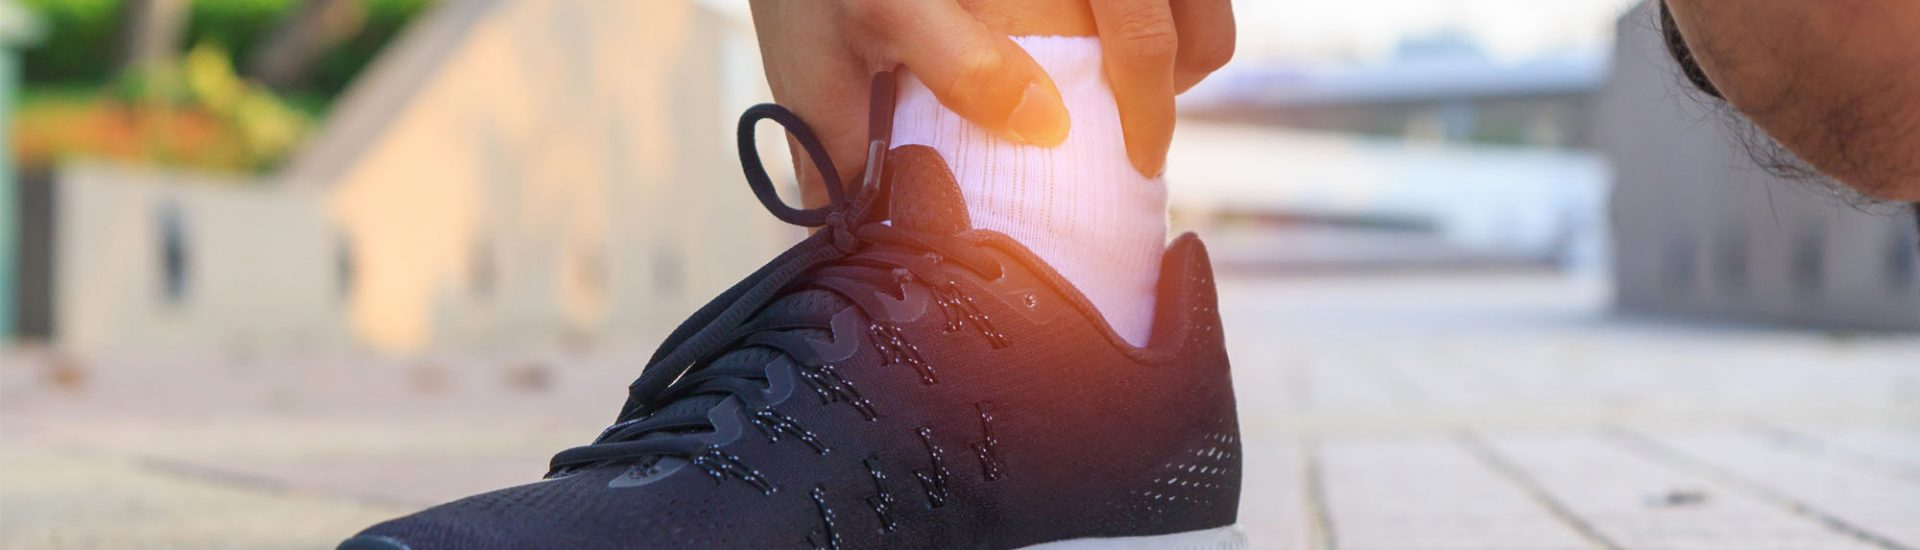 Fußschmerzen: Ursachen, Diagnose & Therapie